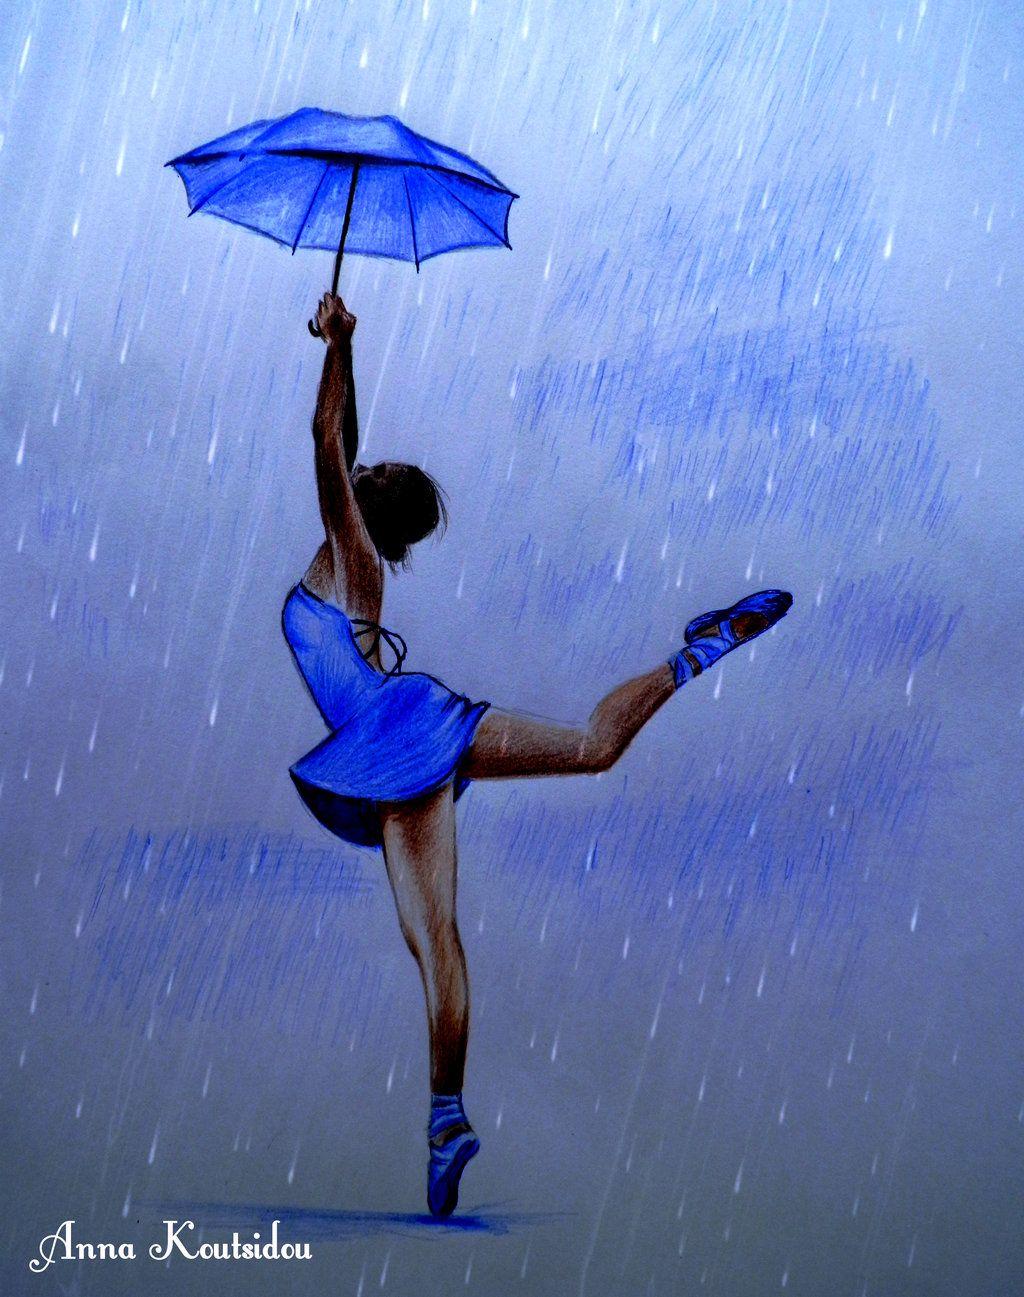 Gallery For > Dancing In The Rain Clip Art | POSTING ...